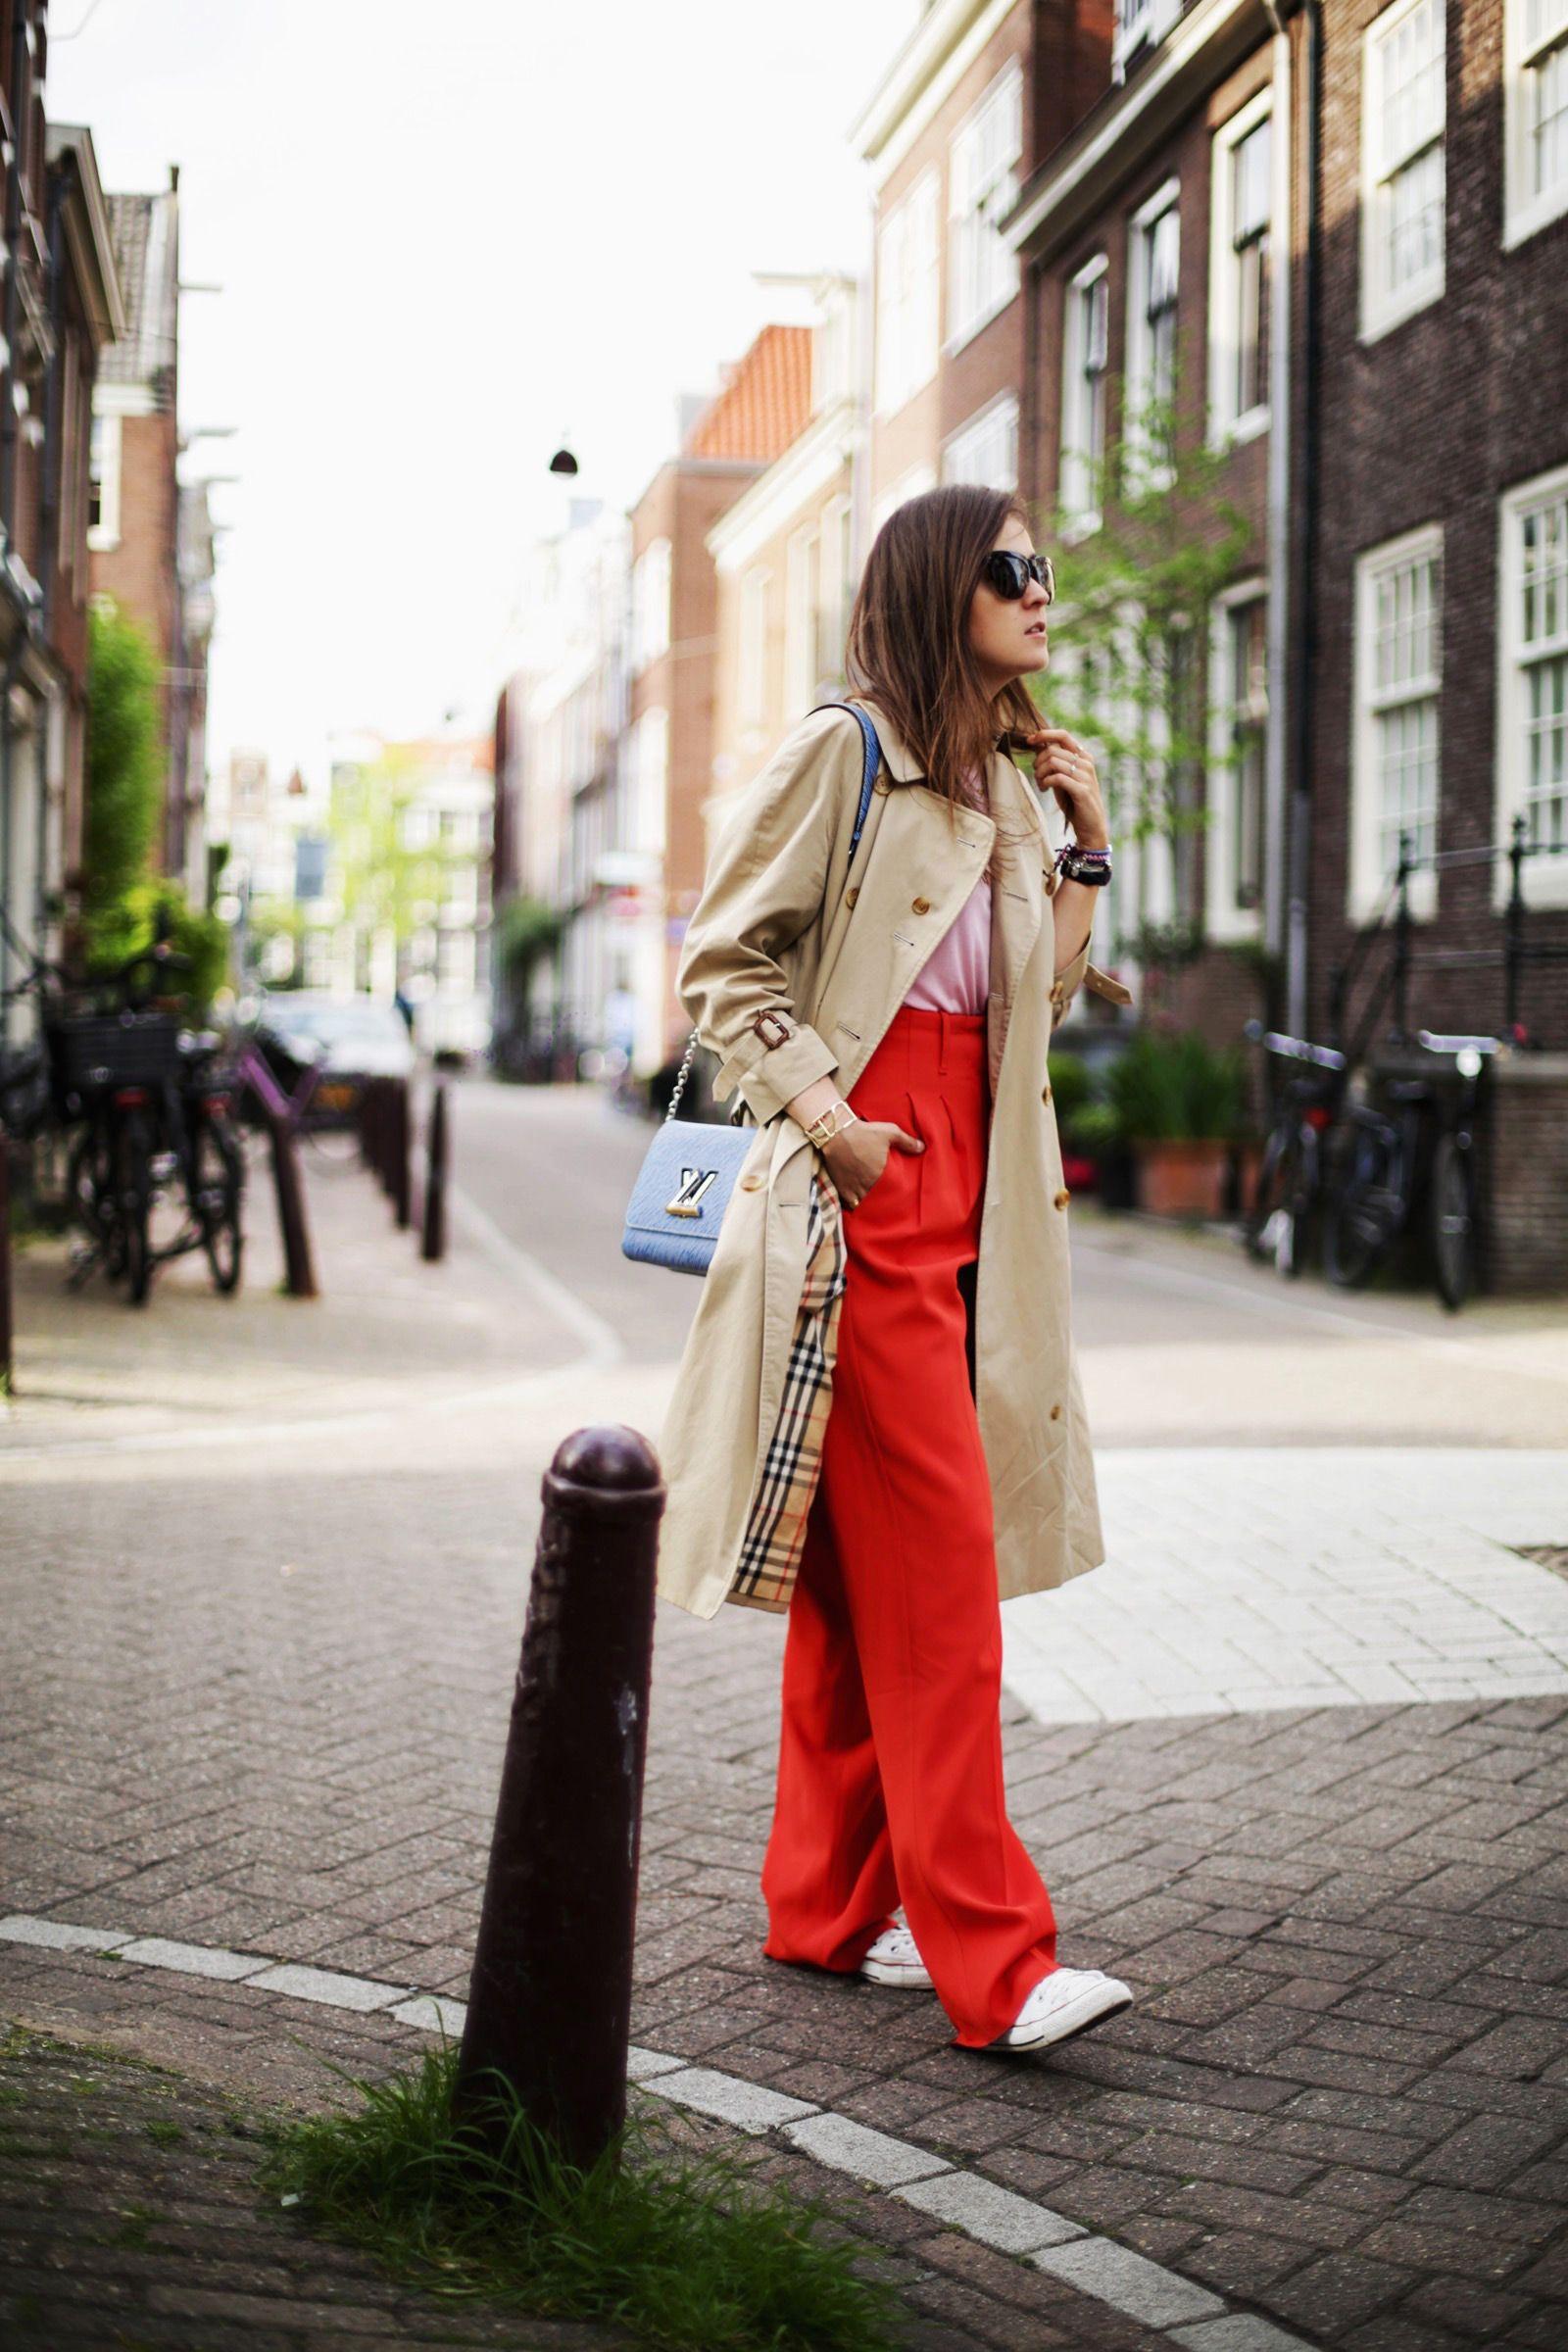 Style Scrapbook / AMSTERDAM // #Fashion, #FashionBlog, #FashionBlogger, #Ootd, #OutfitOfTheDay, #Style